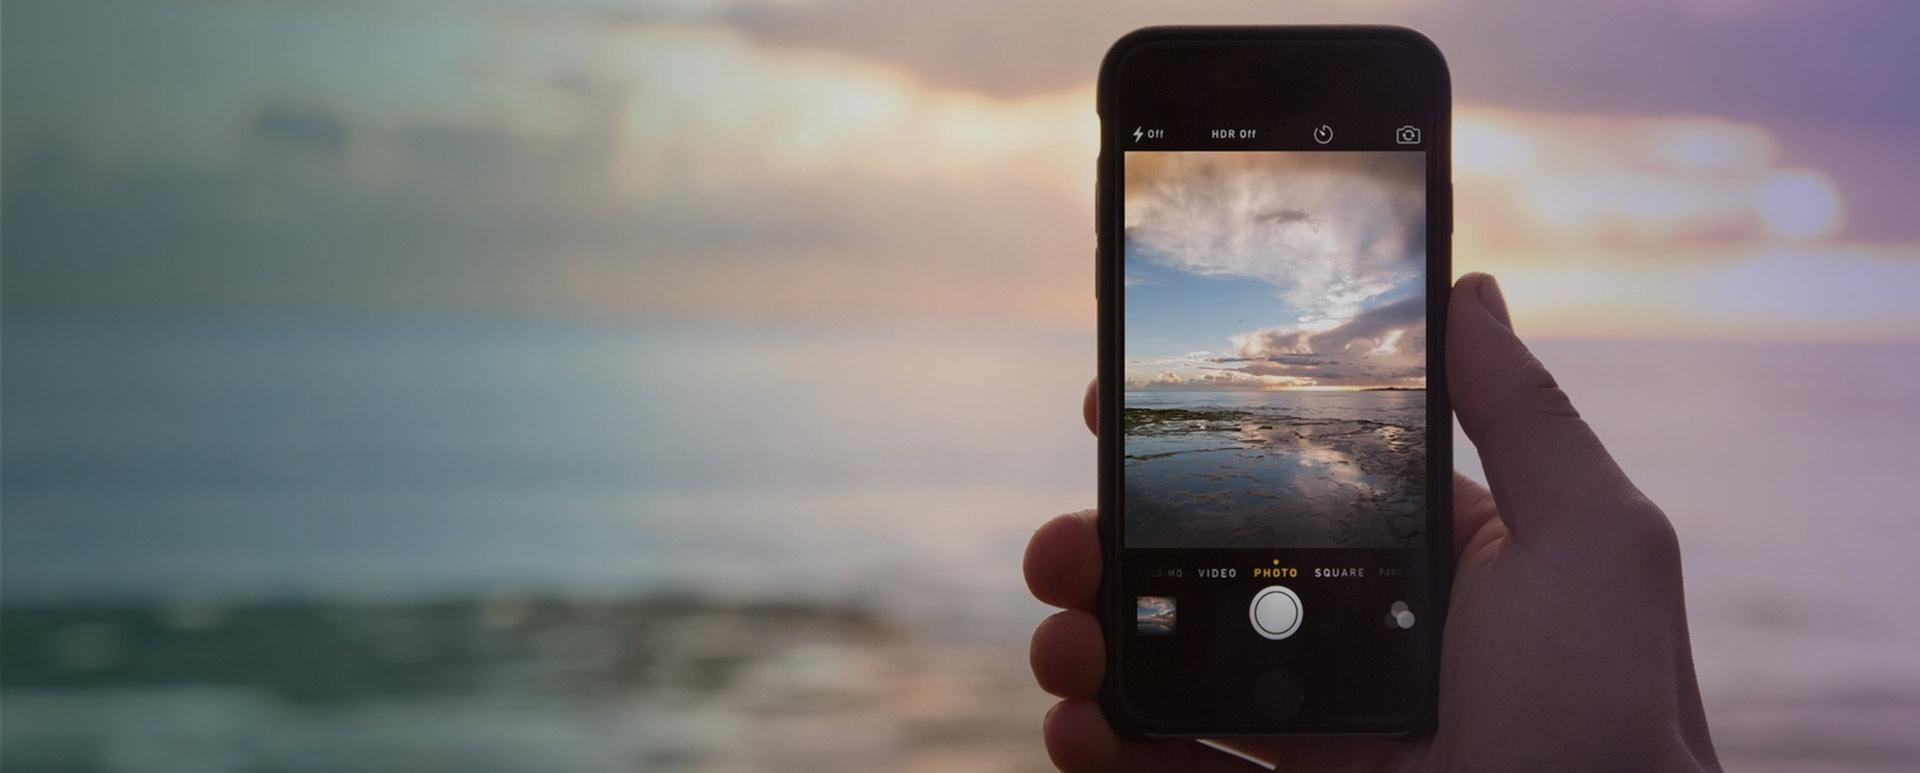 app-per-modificare-foto-gratis